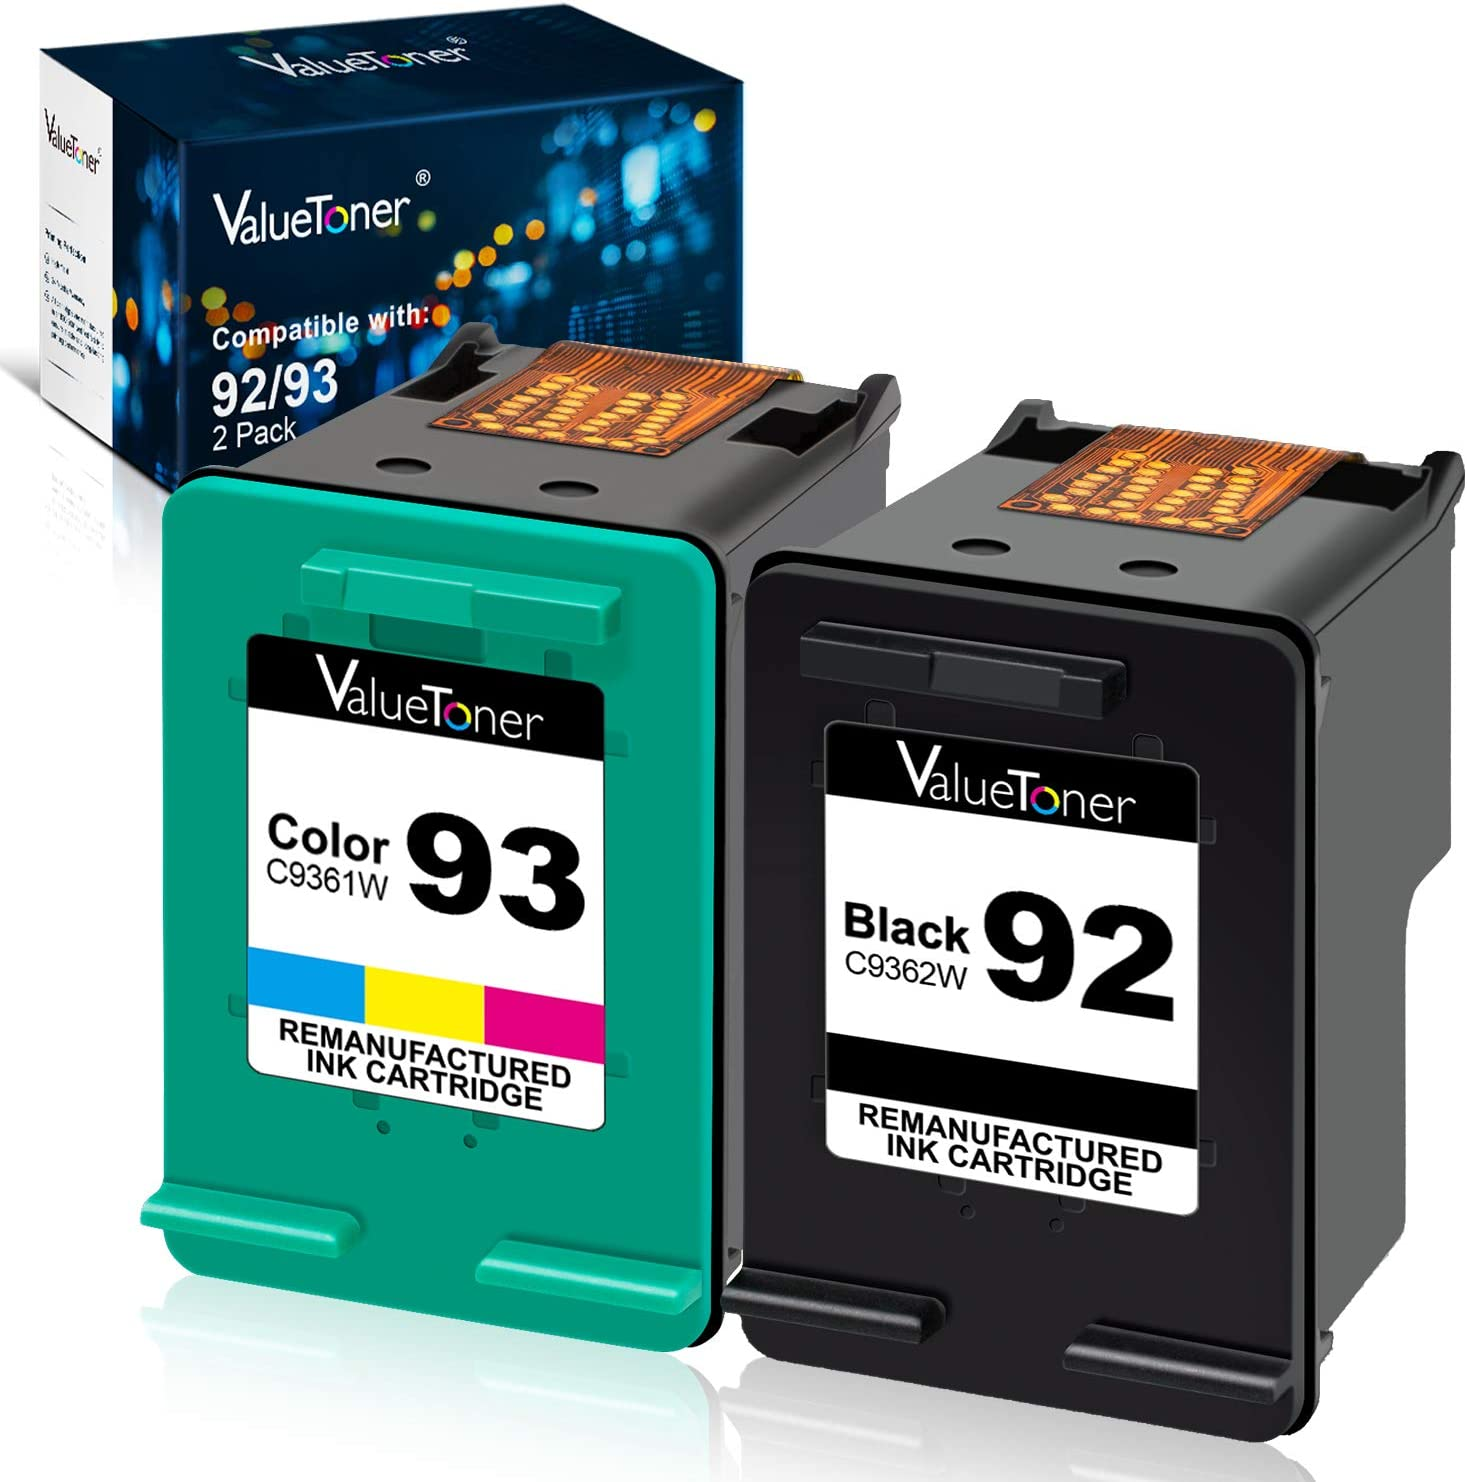 Valuetoner Remanufactured Ink Cartridges Replacement for HP 92 & 93 C9513FN C9362WN C9361WN for Photosmart 7850 C3150 C3180, Deskjet 5440 5420, PSC 1510 2525 Printer (1 Black, 1 Tri-Color, 2 Pack)